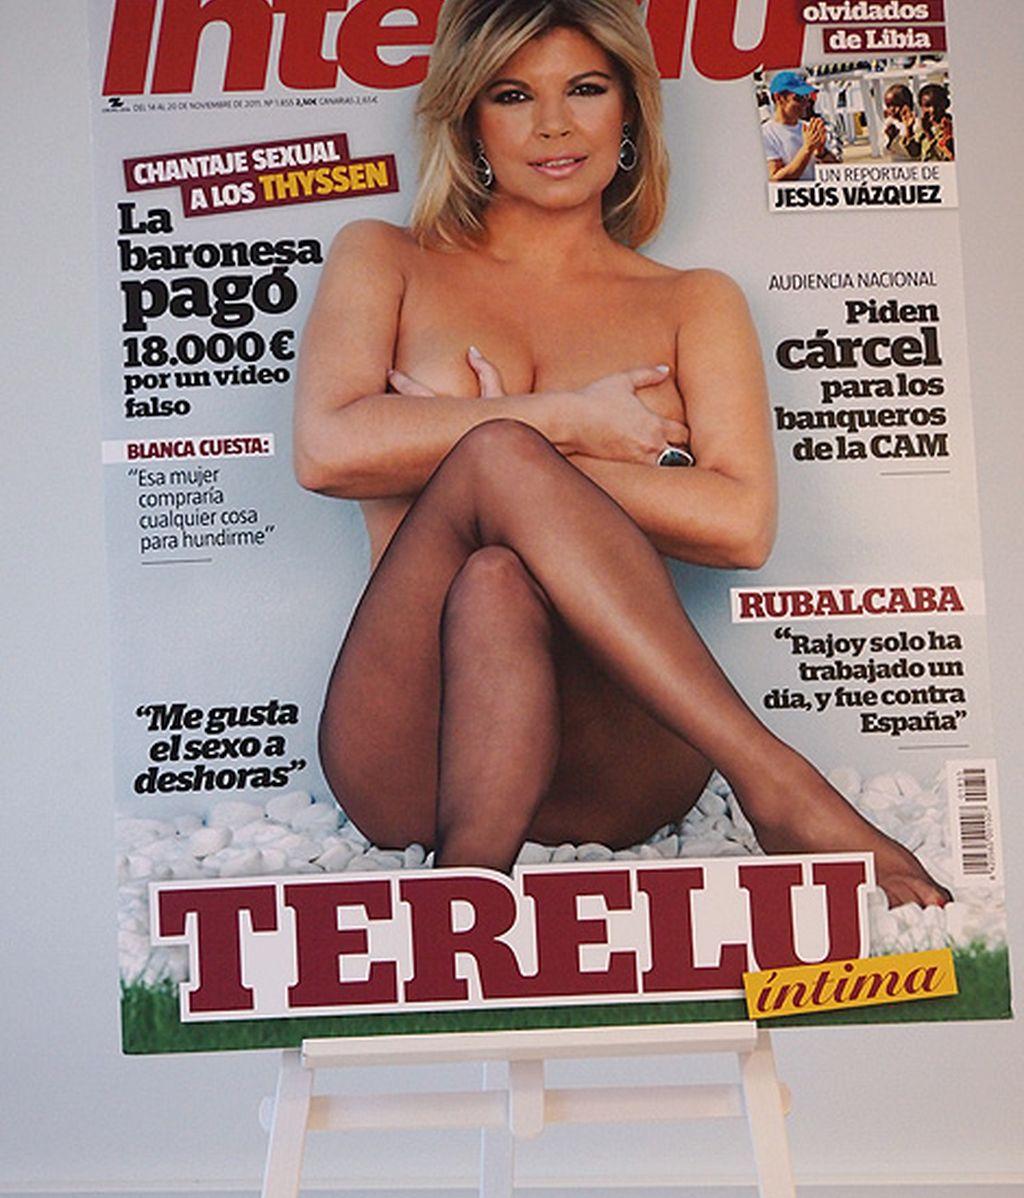 La portada de 'Interviú' de Terelu Campos